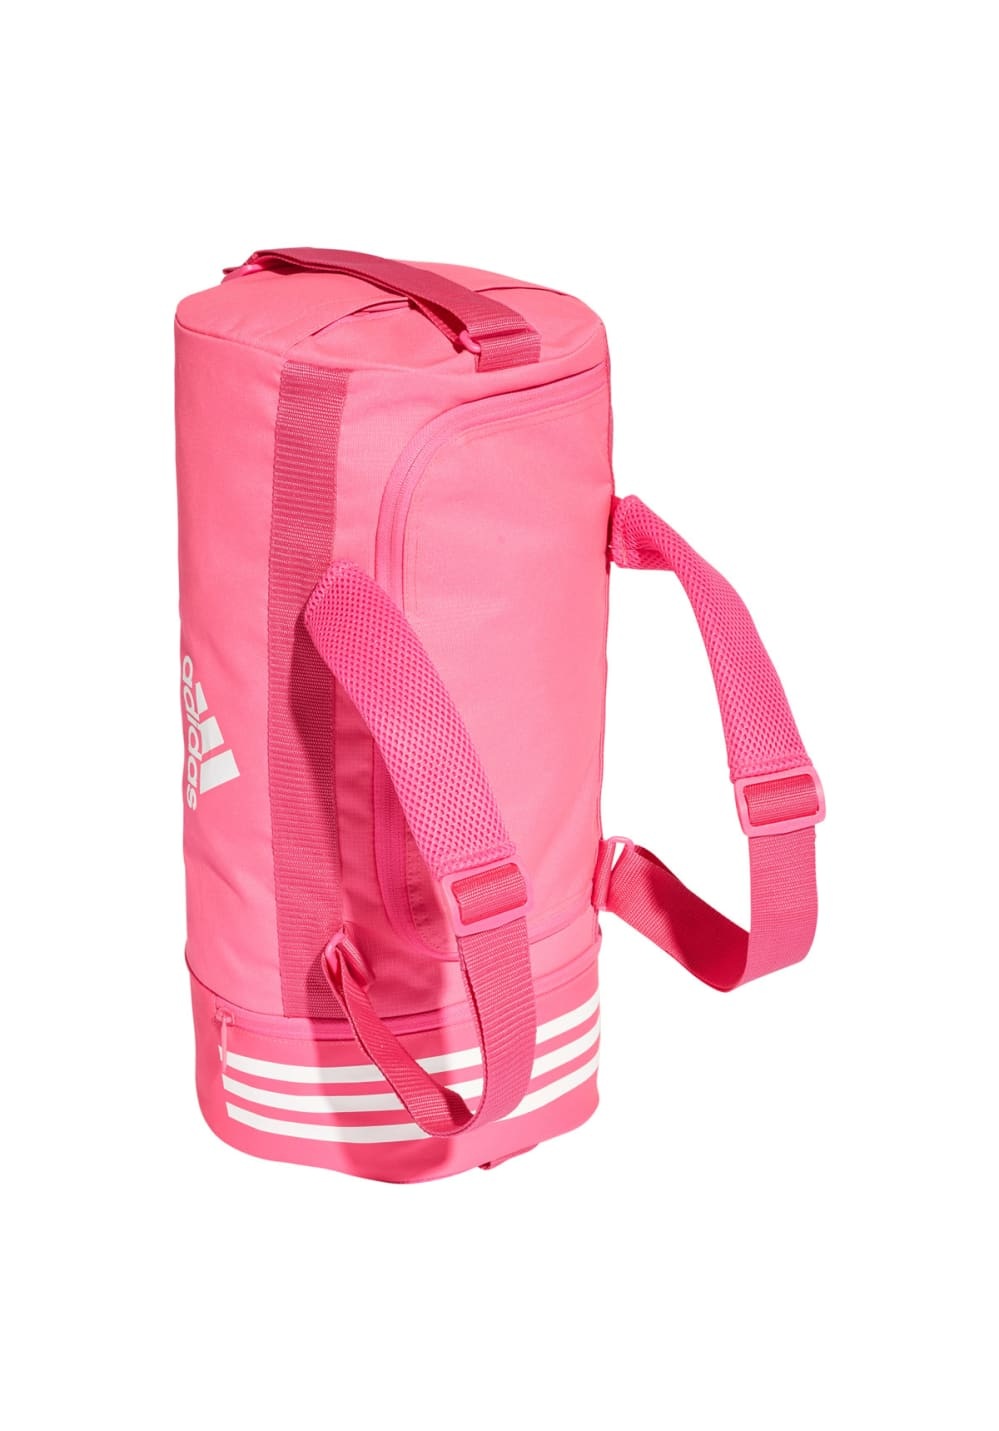 b8b7bbf43 adidas Convertible 3-Stripes Duffel Bag Small - Sports bags - Pink ...